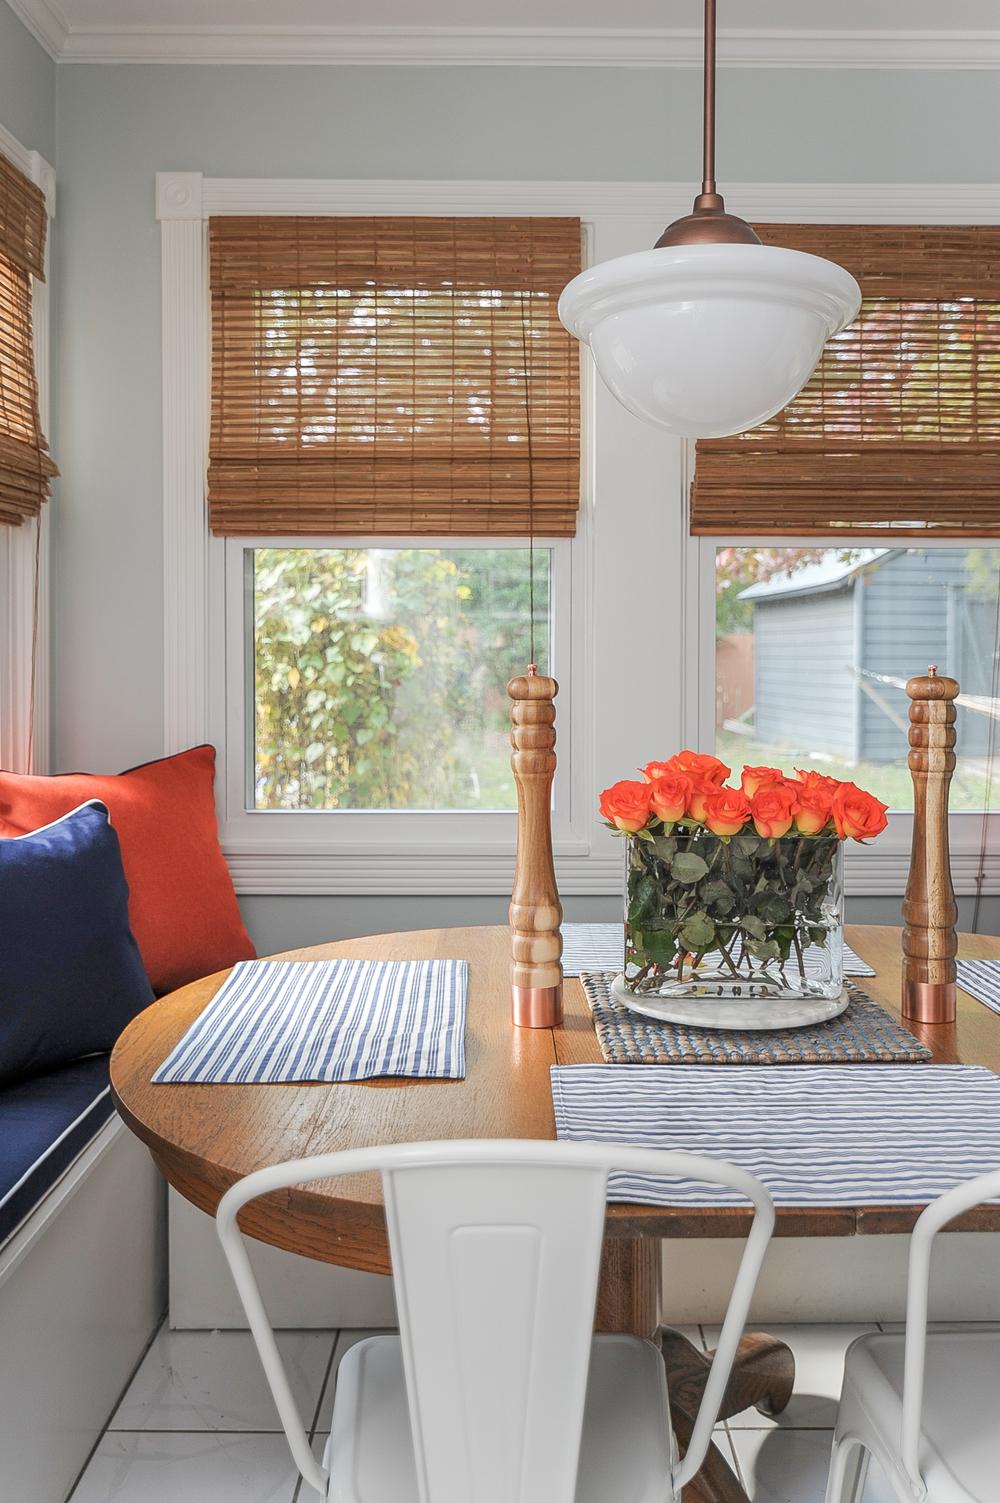 Artful Interiors – Bachelor Pad - Kitchen Roses